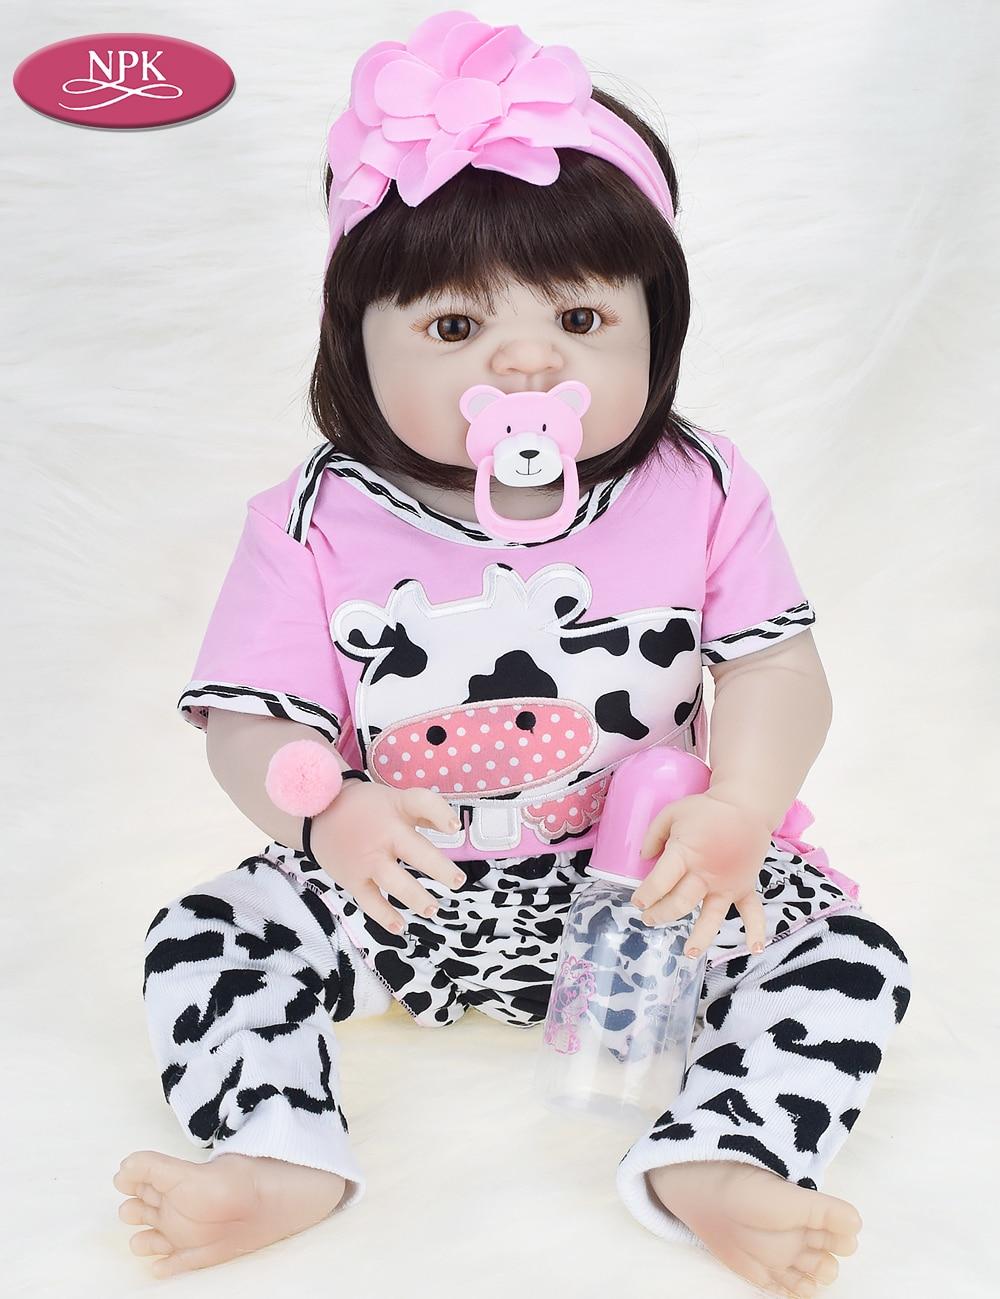 NPK Real 57CM Full Body SIlicone Girl Reborn Babies Doll Bath Toy Lifelike Newborn Princess Baby Doll Bonecas Bebe Reborn Menina (6)